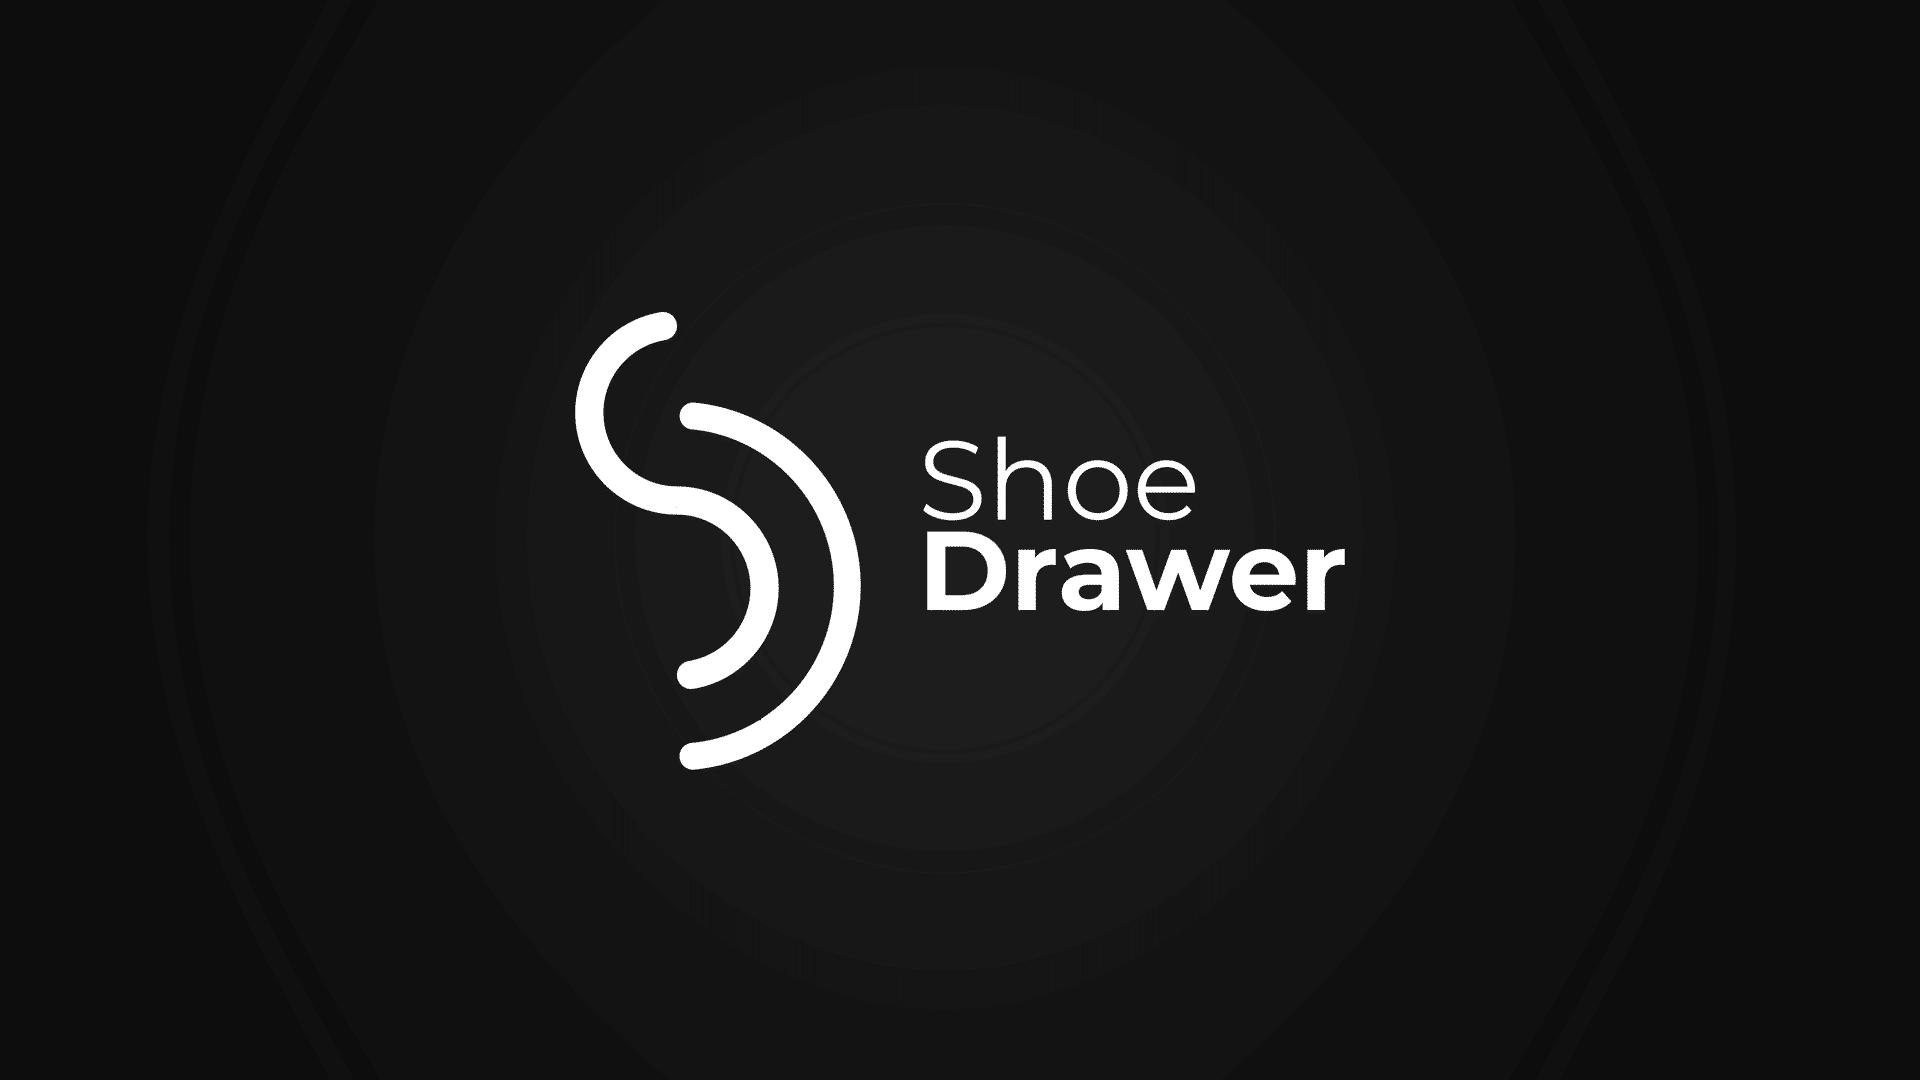 shoe drаwer logo design